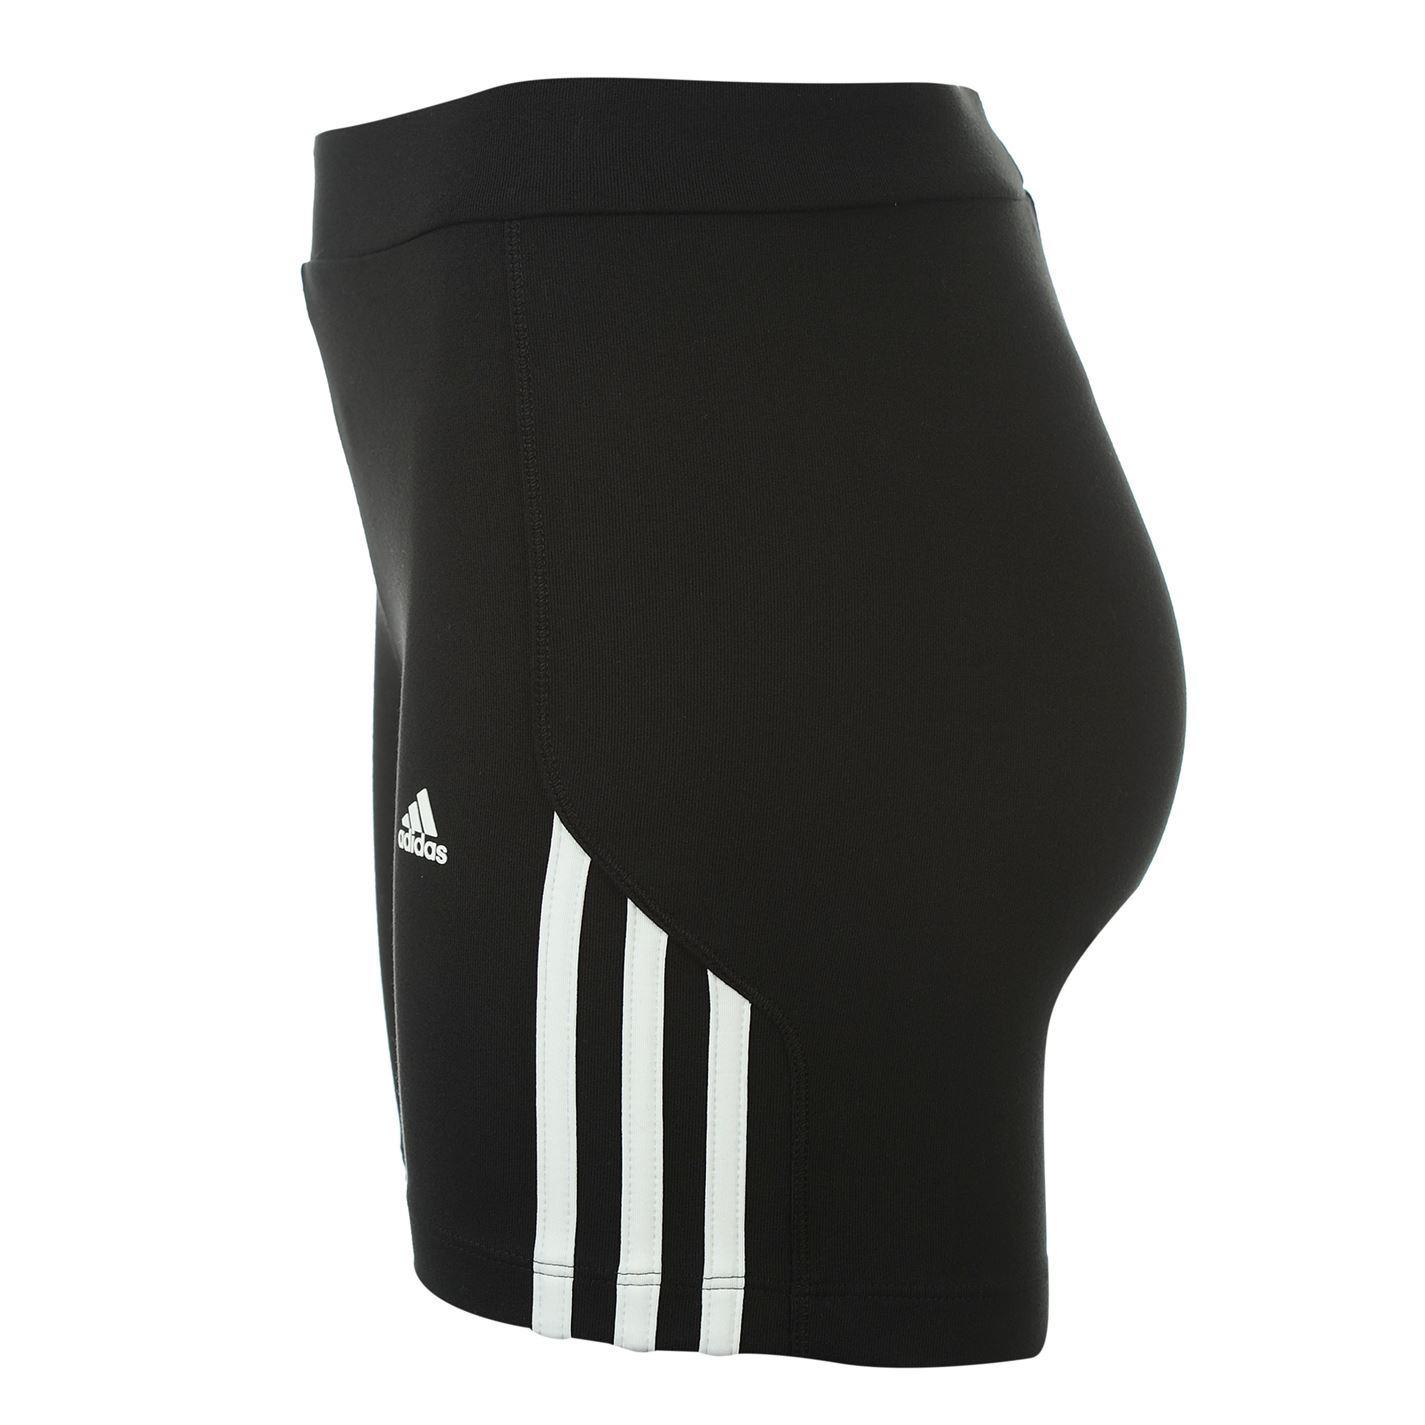 meet f030f ed6f1 ... Adidas 3 Stripe Gym Fitness Tight Shorts Womens Black White Sport  Exercise Short ...